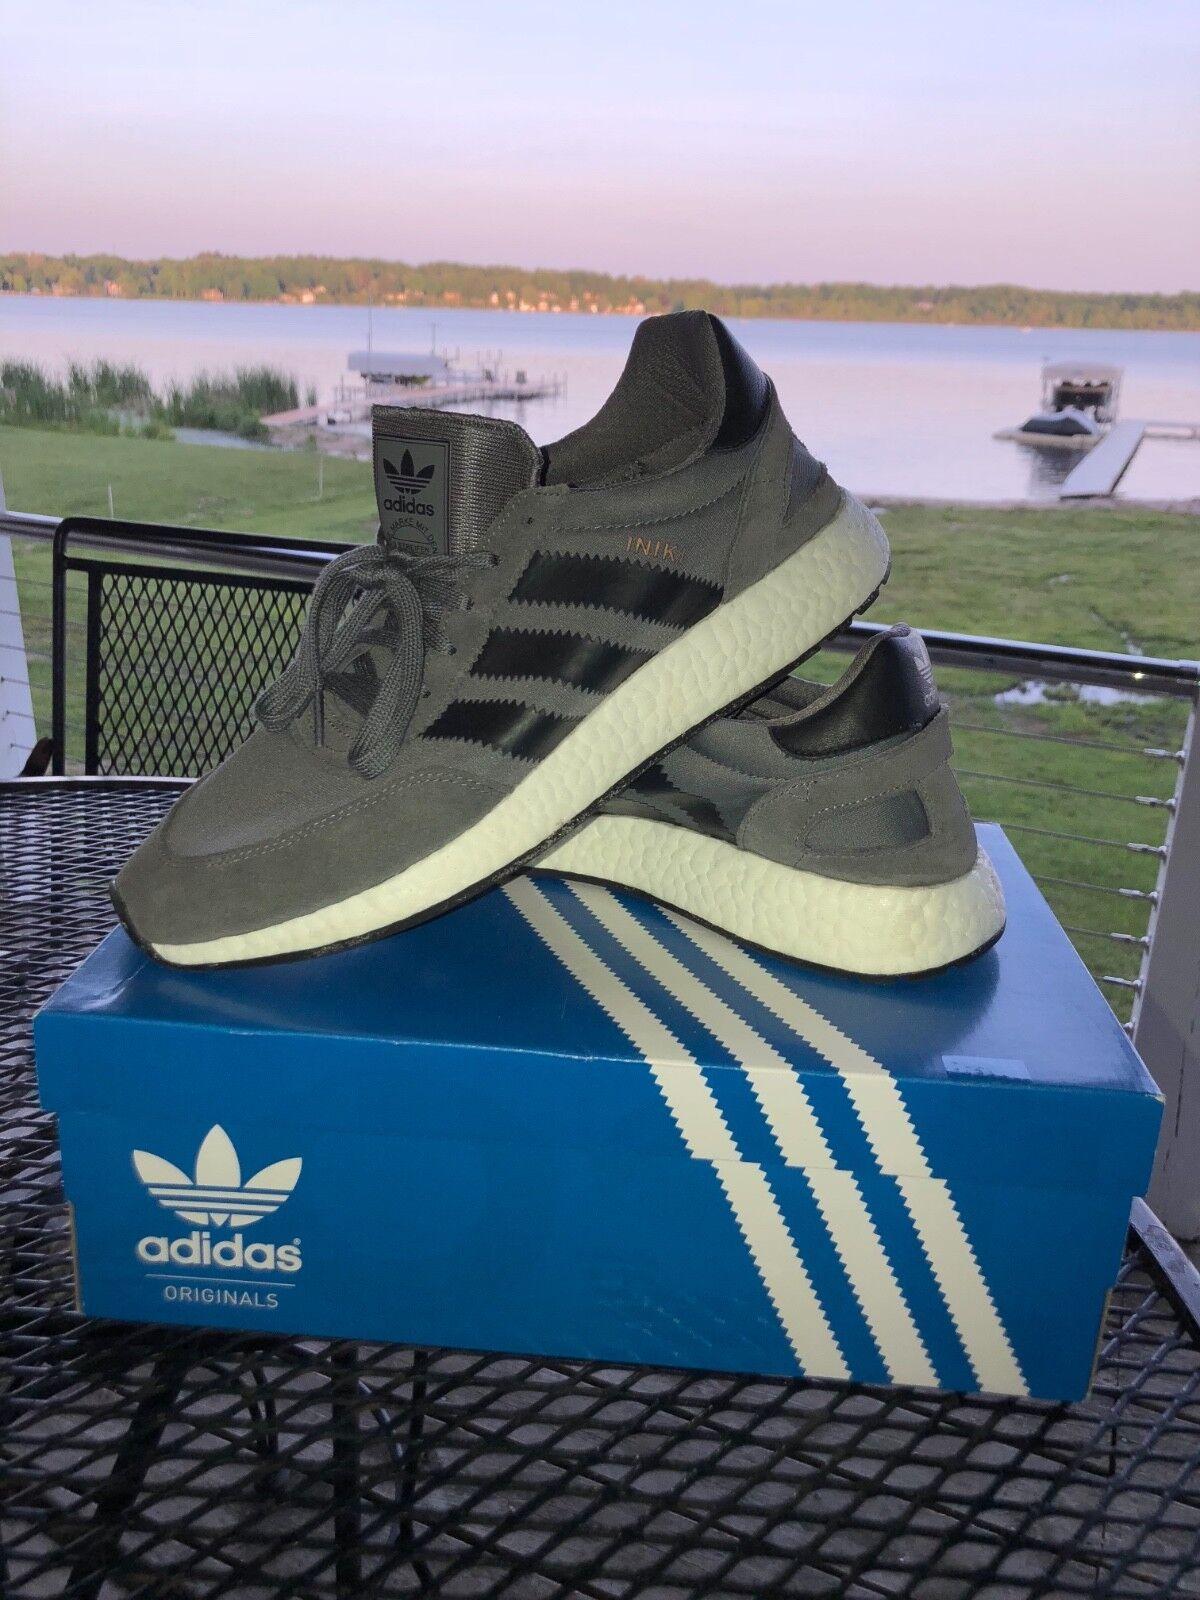 Adidas Iniki runner boost, size 12, Grey